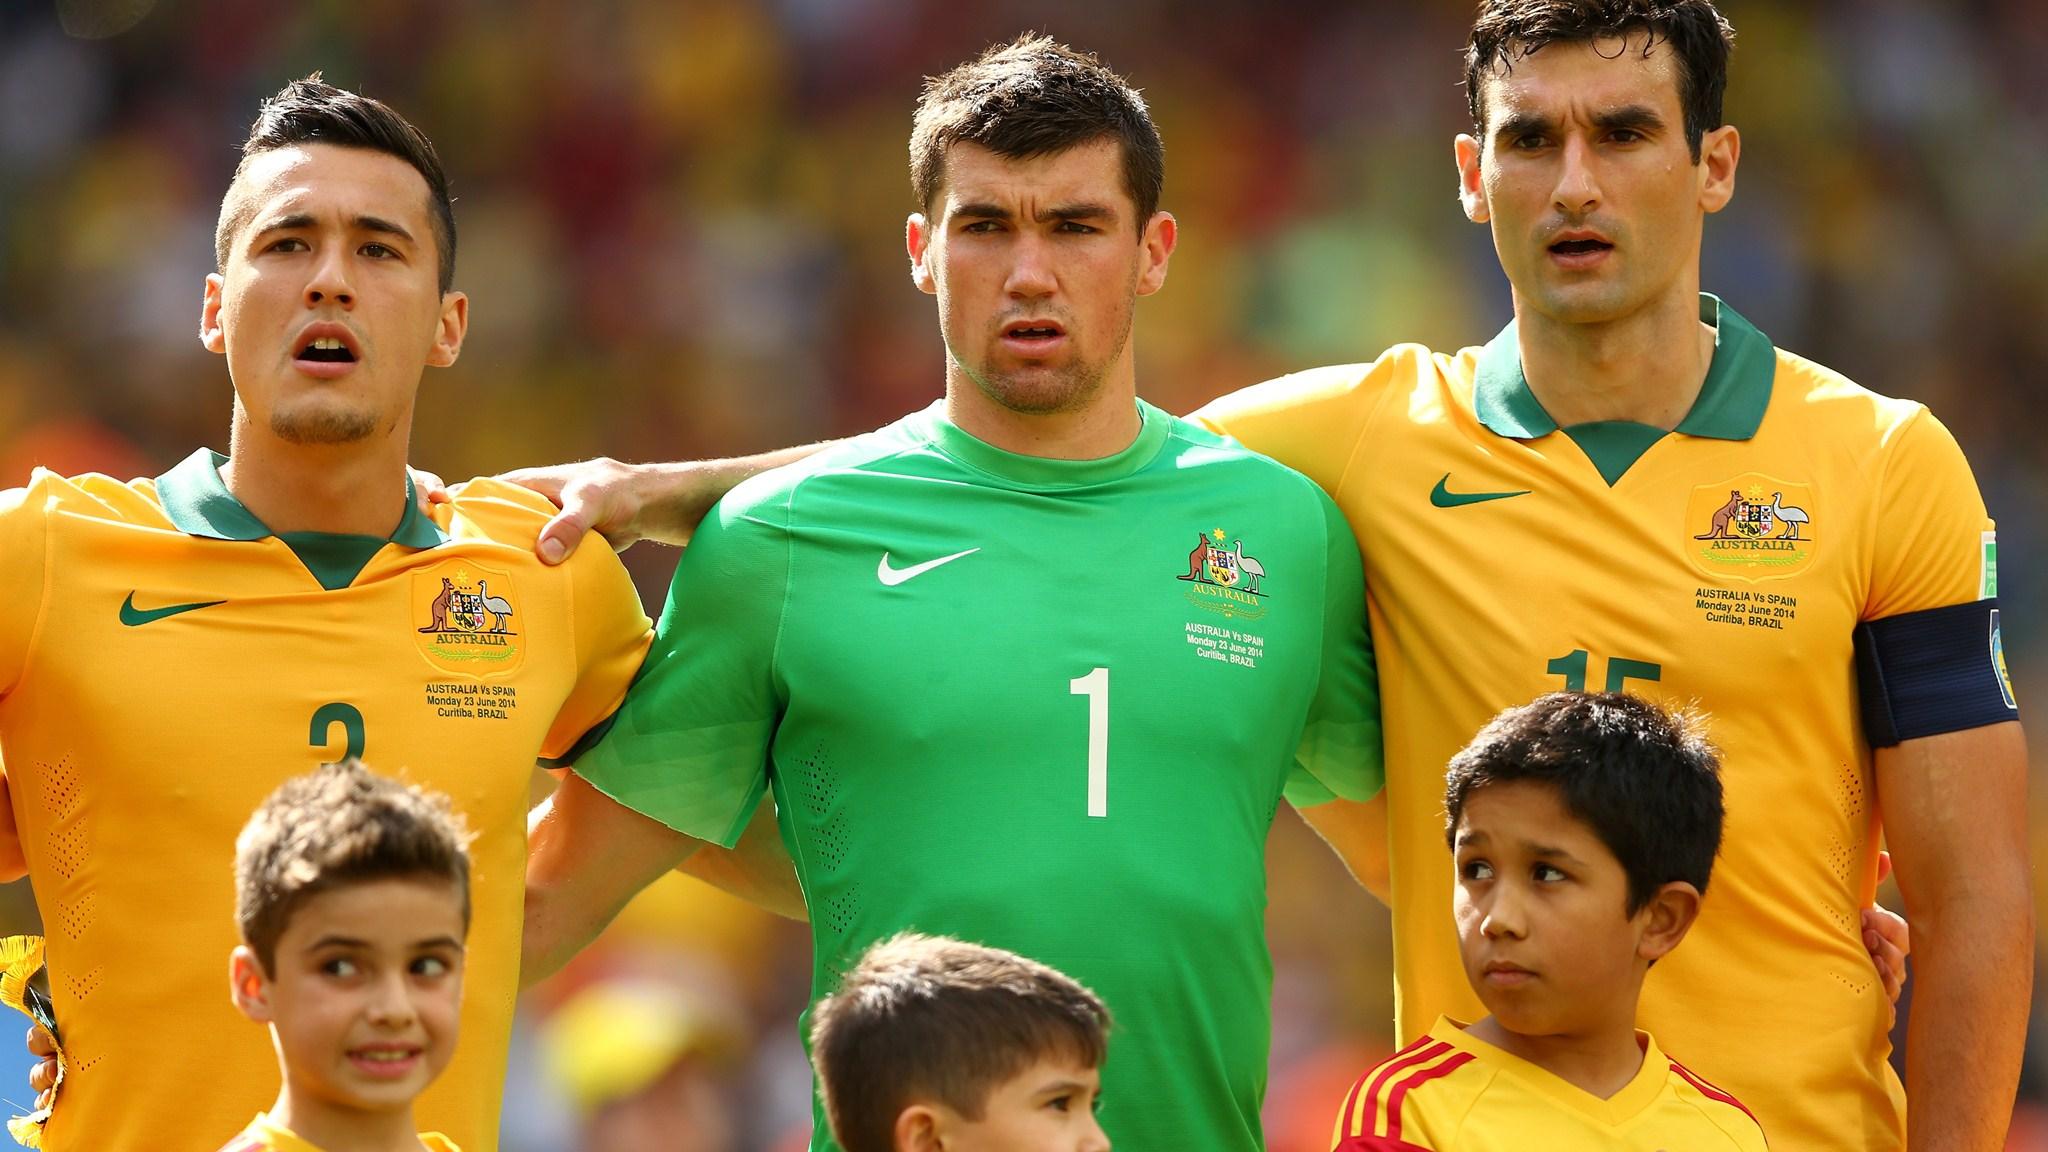 83 - Australia-Spain [0-3] -- 23 Jun 2014 - 13-00 - kuaza